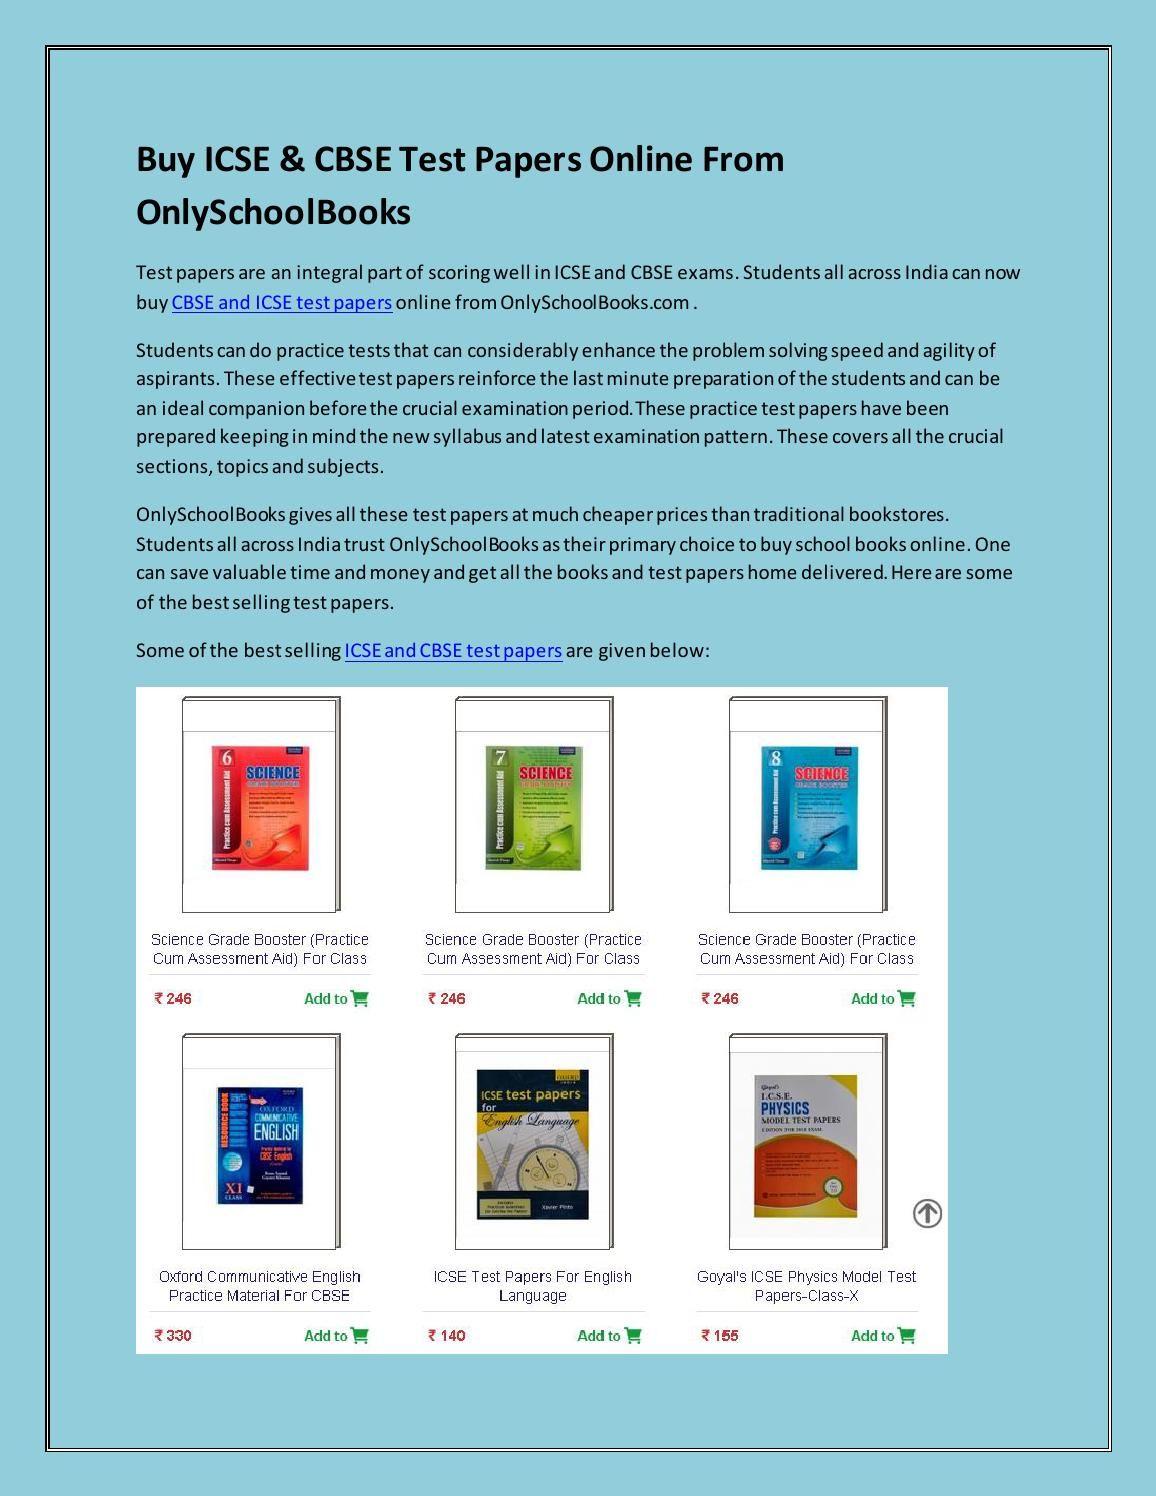 Buy ICSE & CBSE Test Papers Online From OnlySchoolBooks | Buy ...